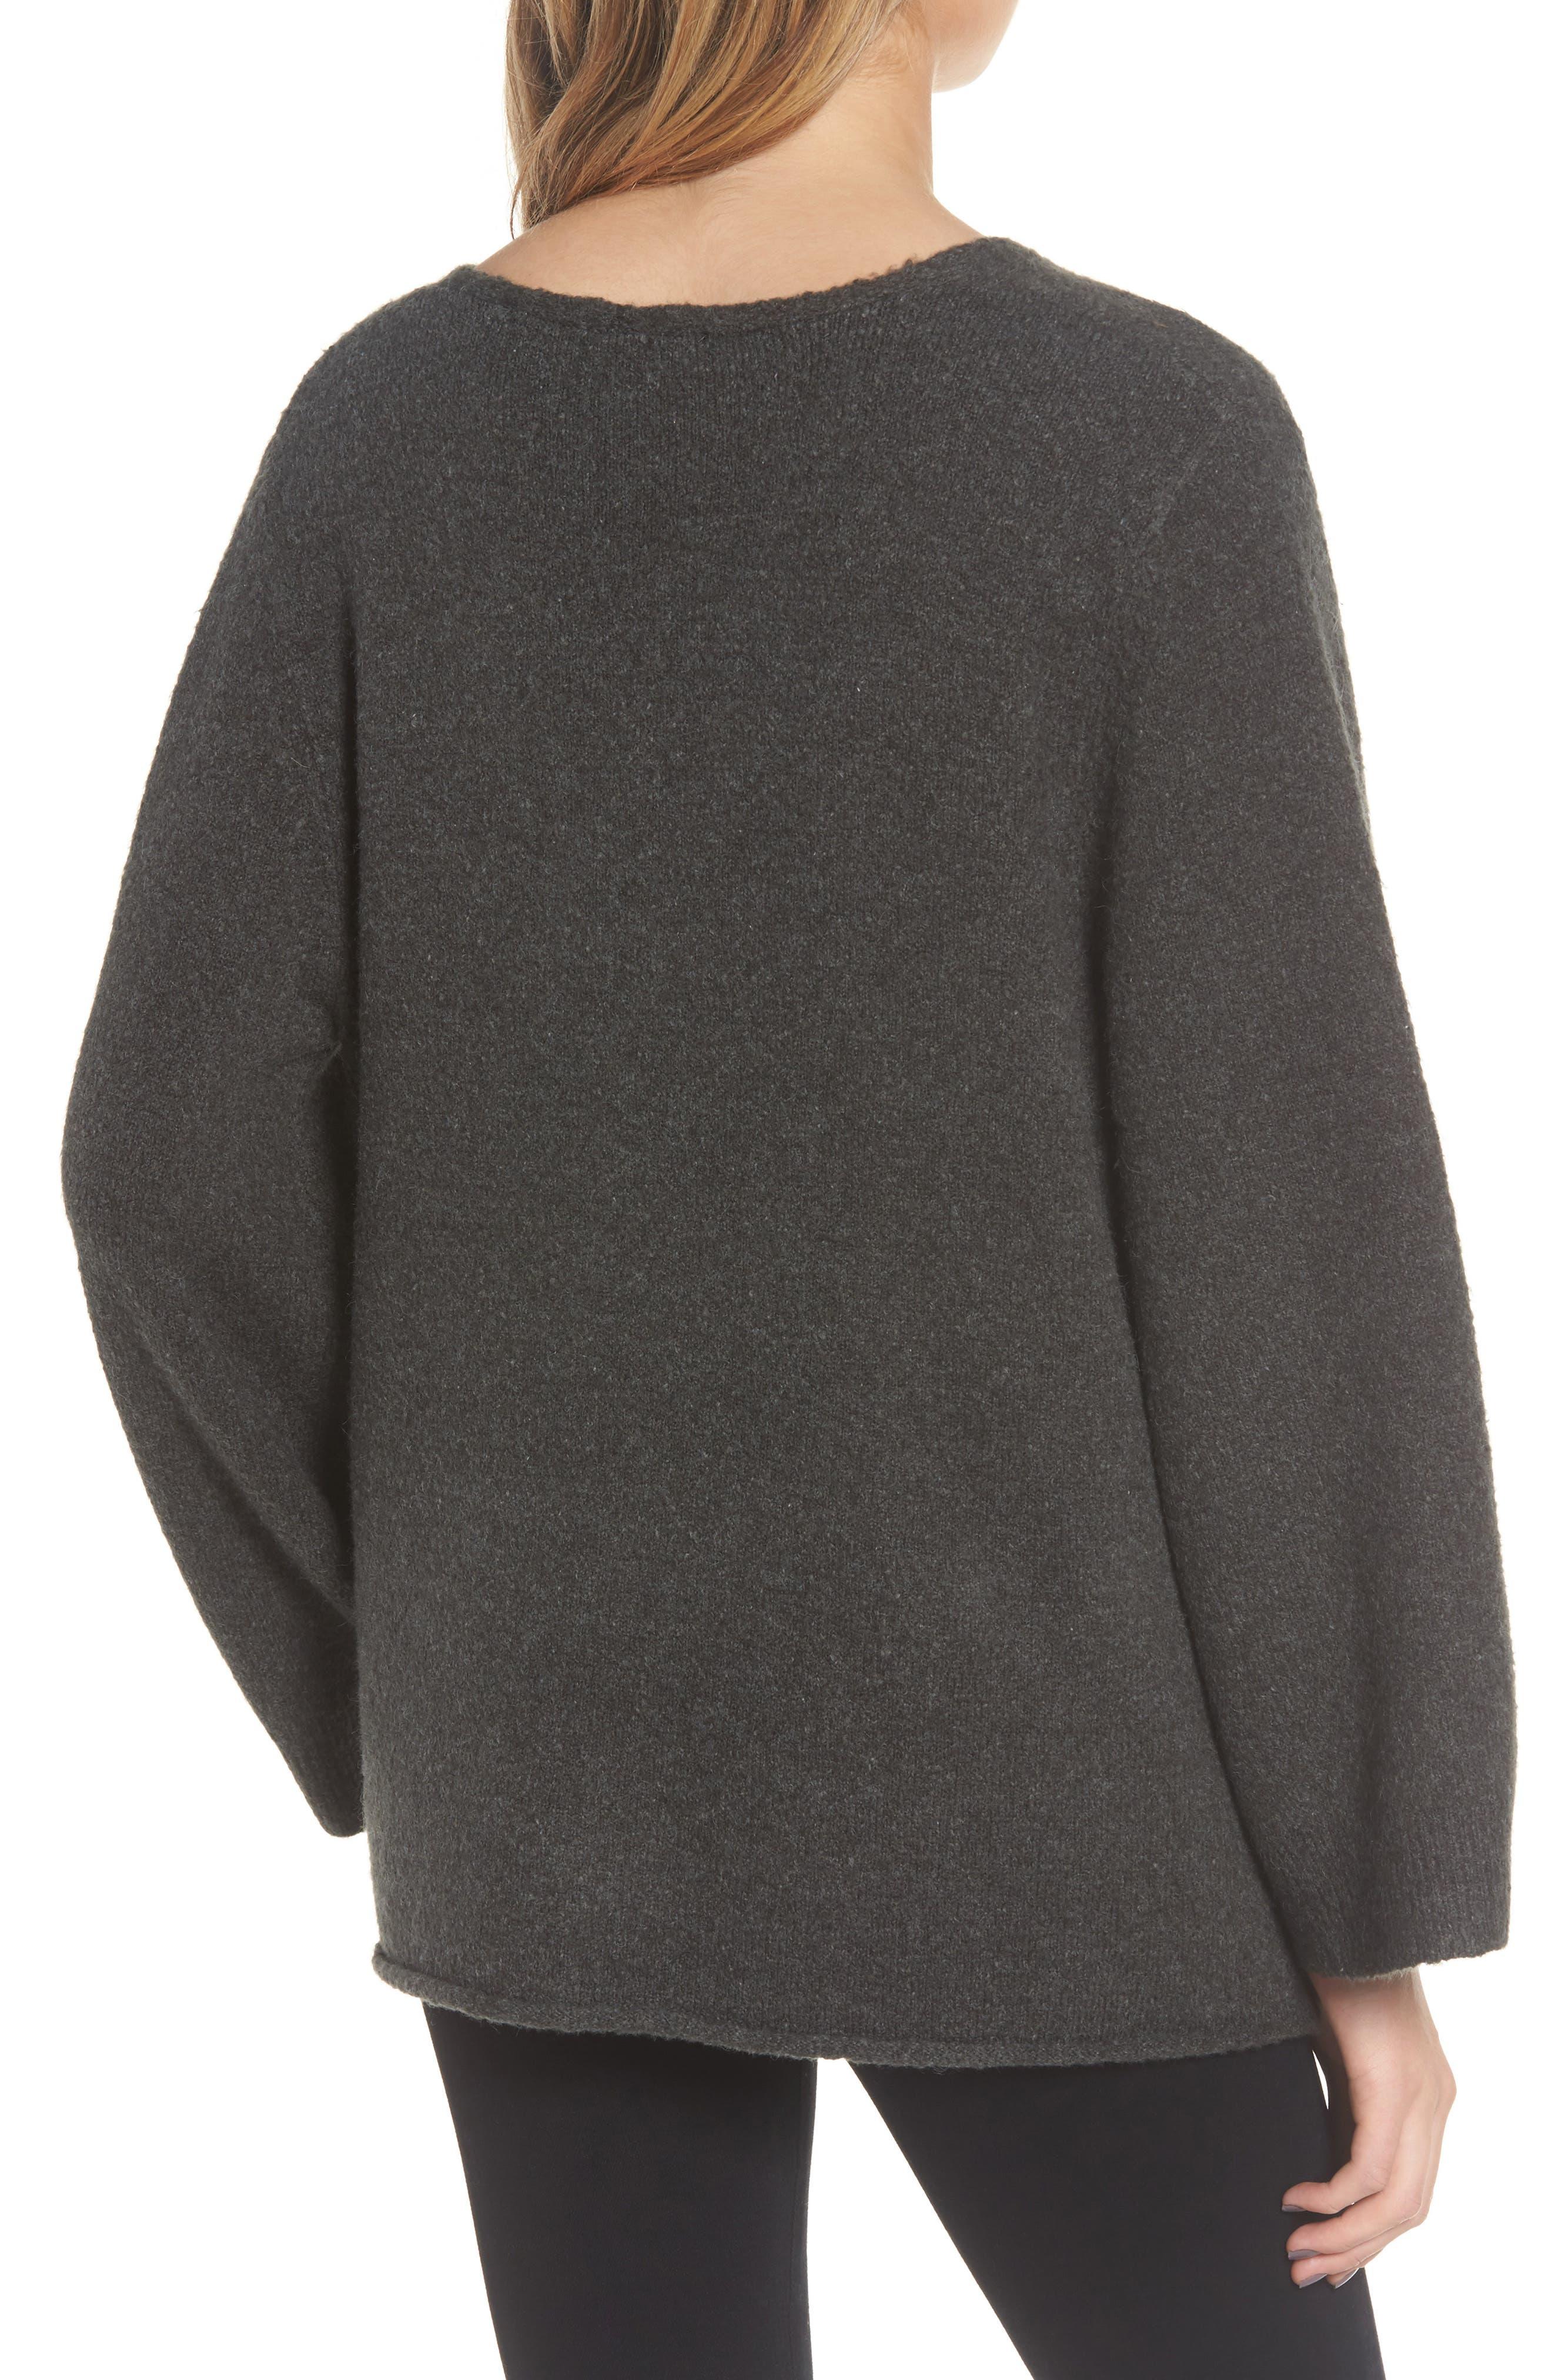 Urban Flossy Sweater,                             Alternate thumbnail 7, color,